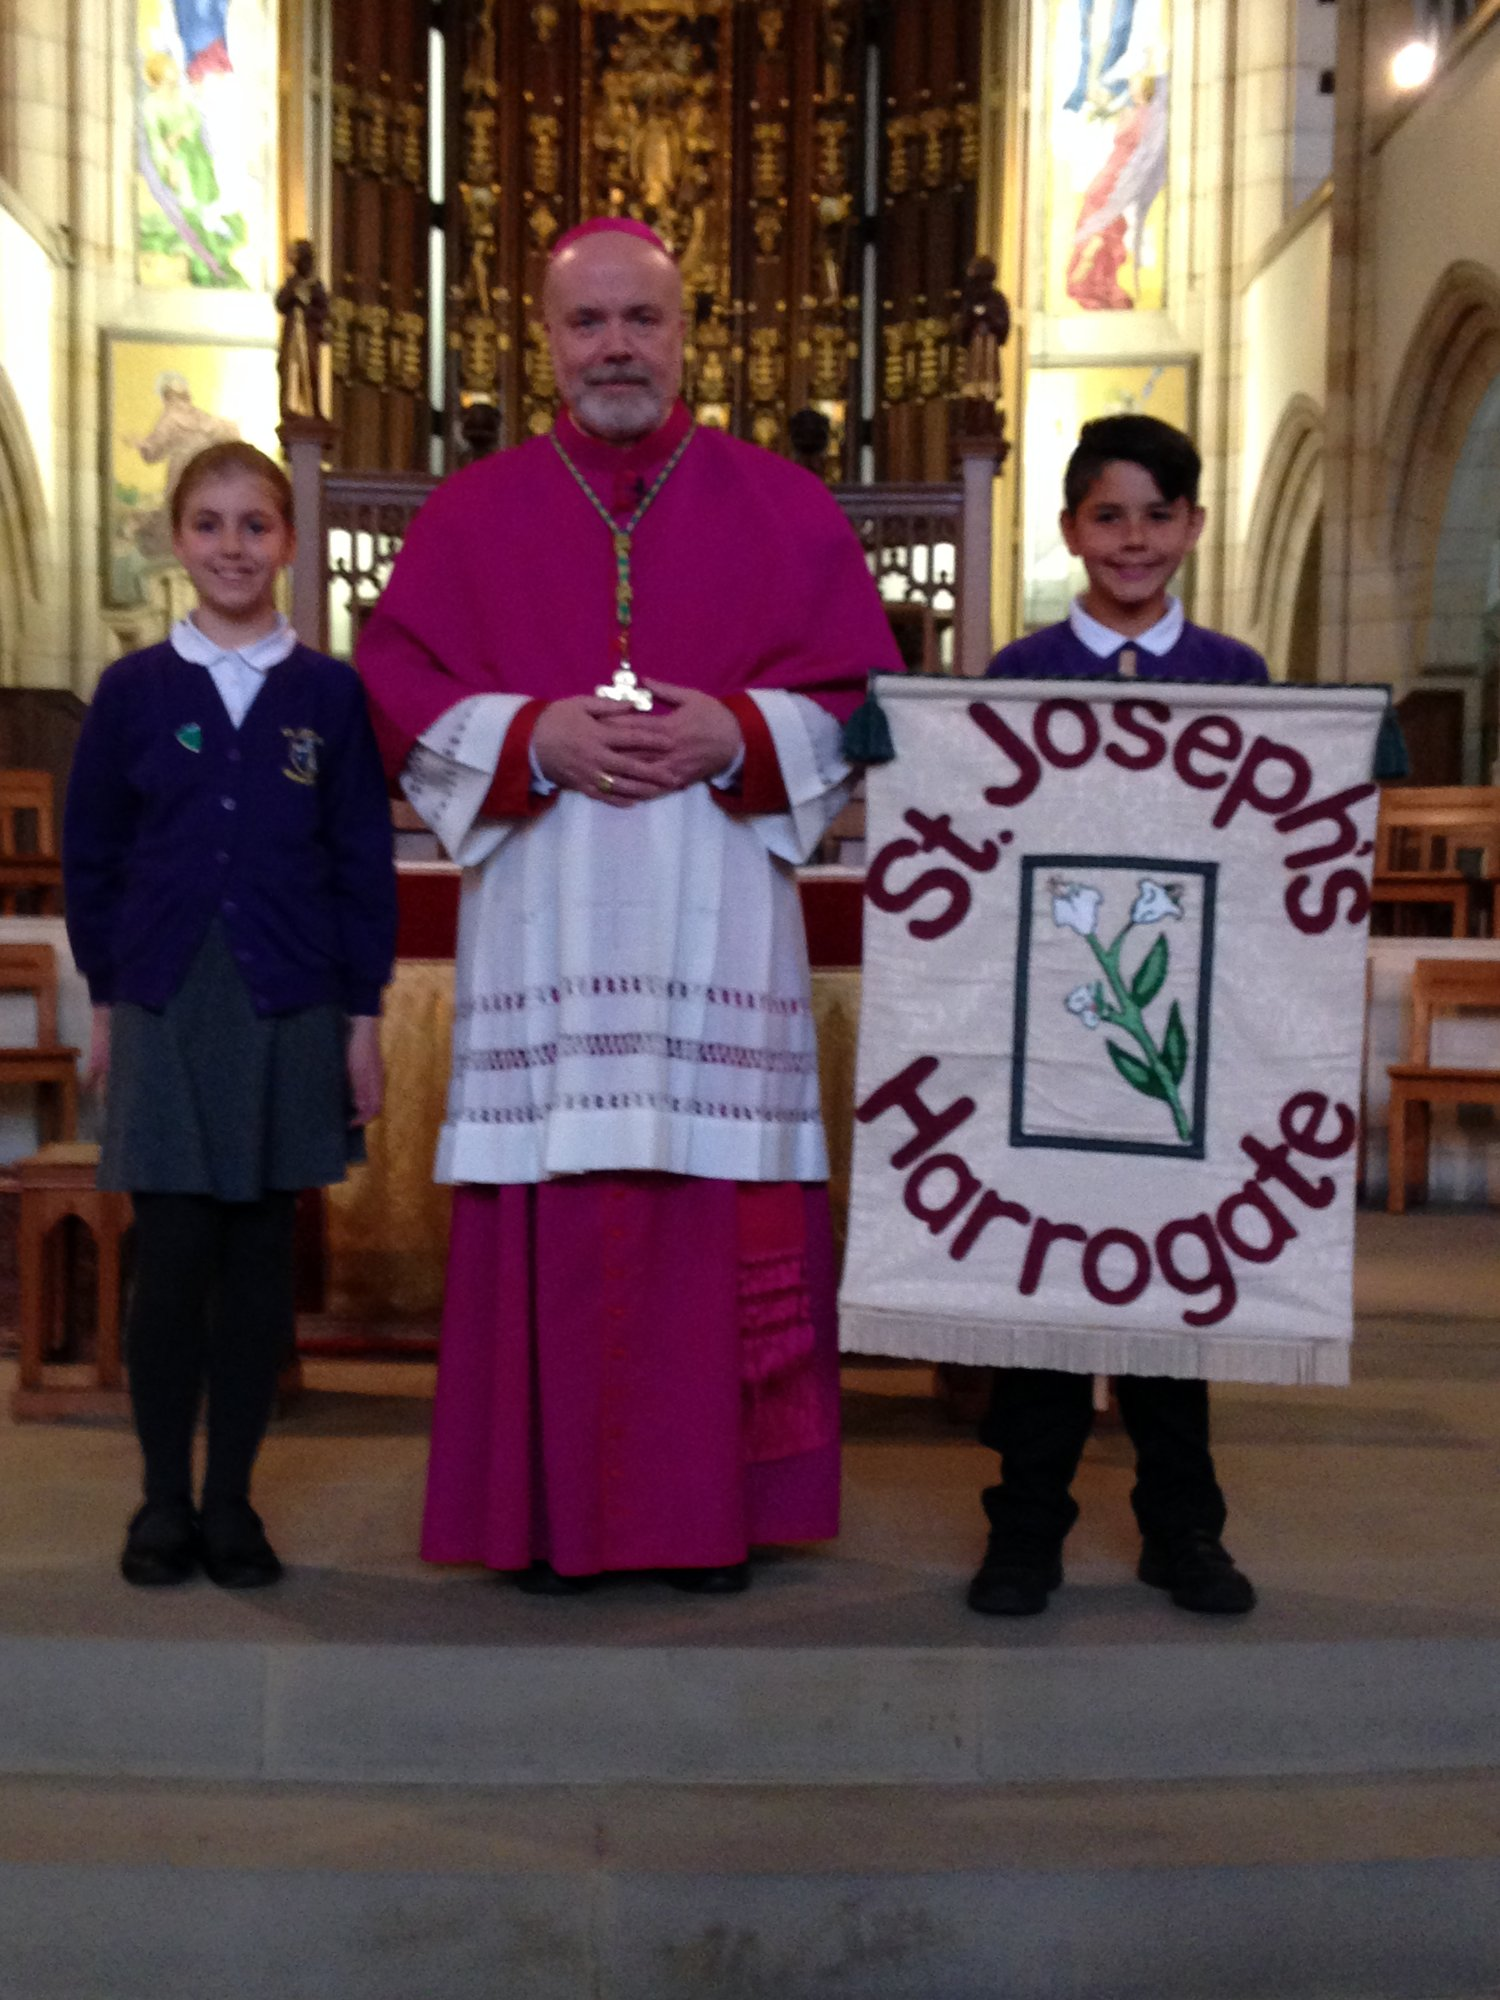 St. Joseph's Harrogate